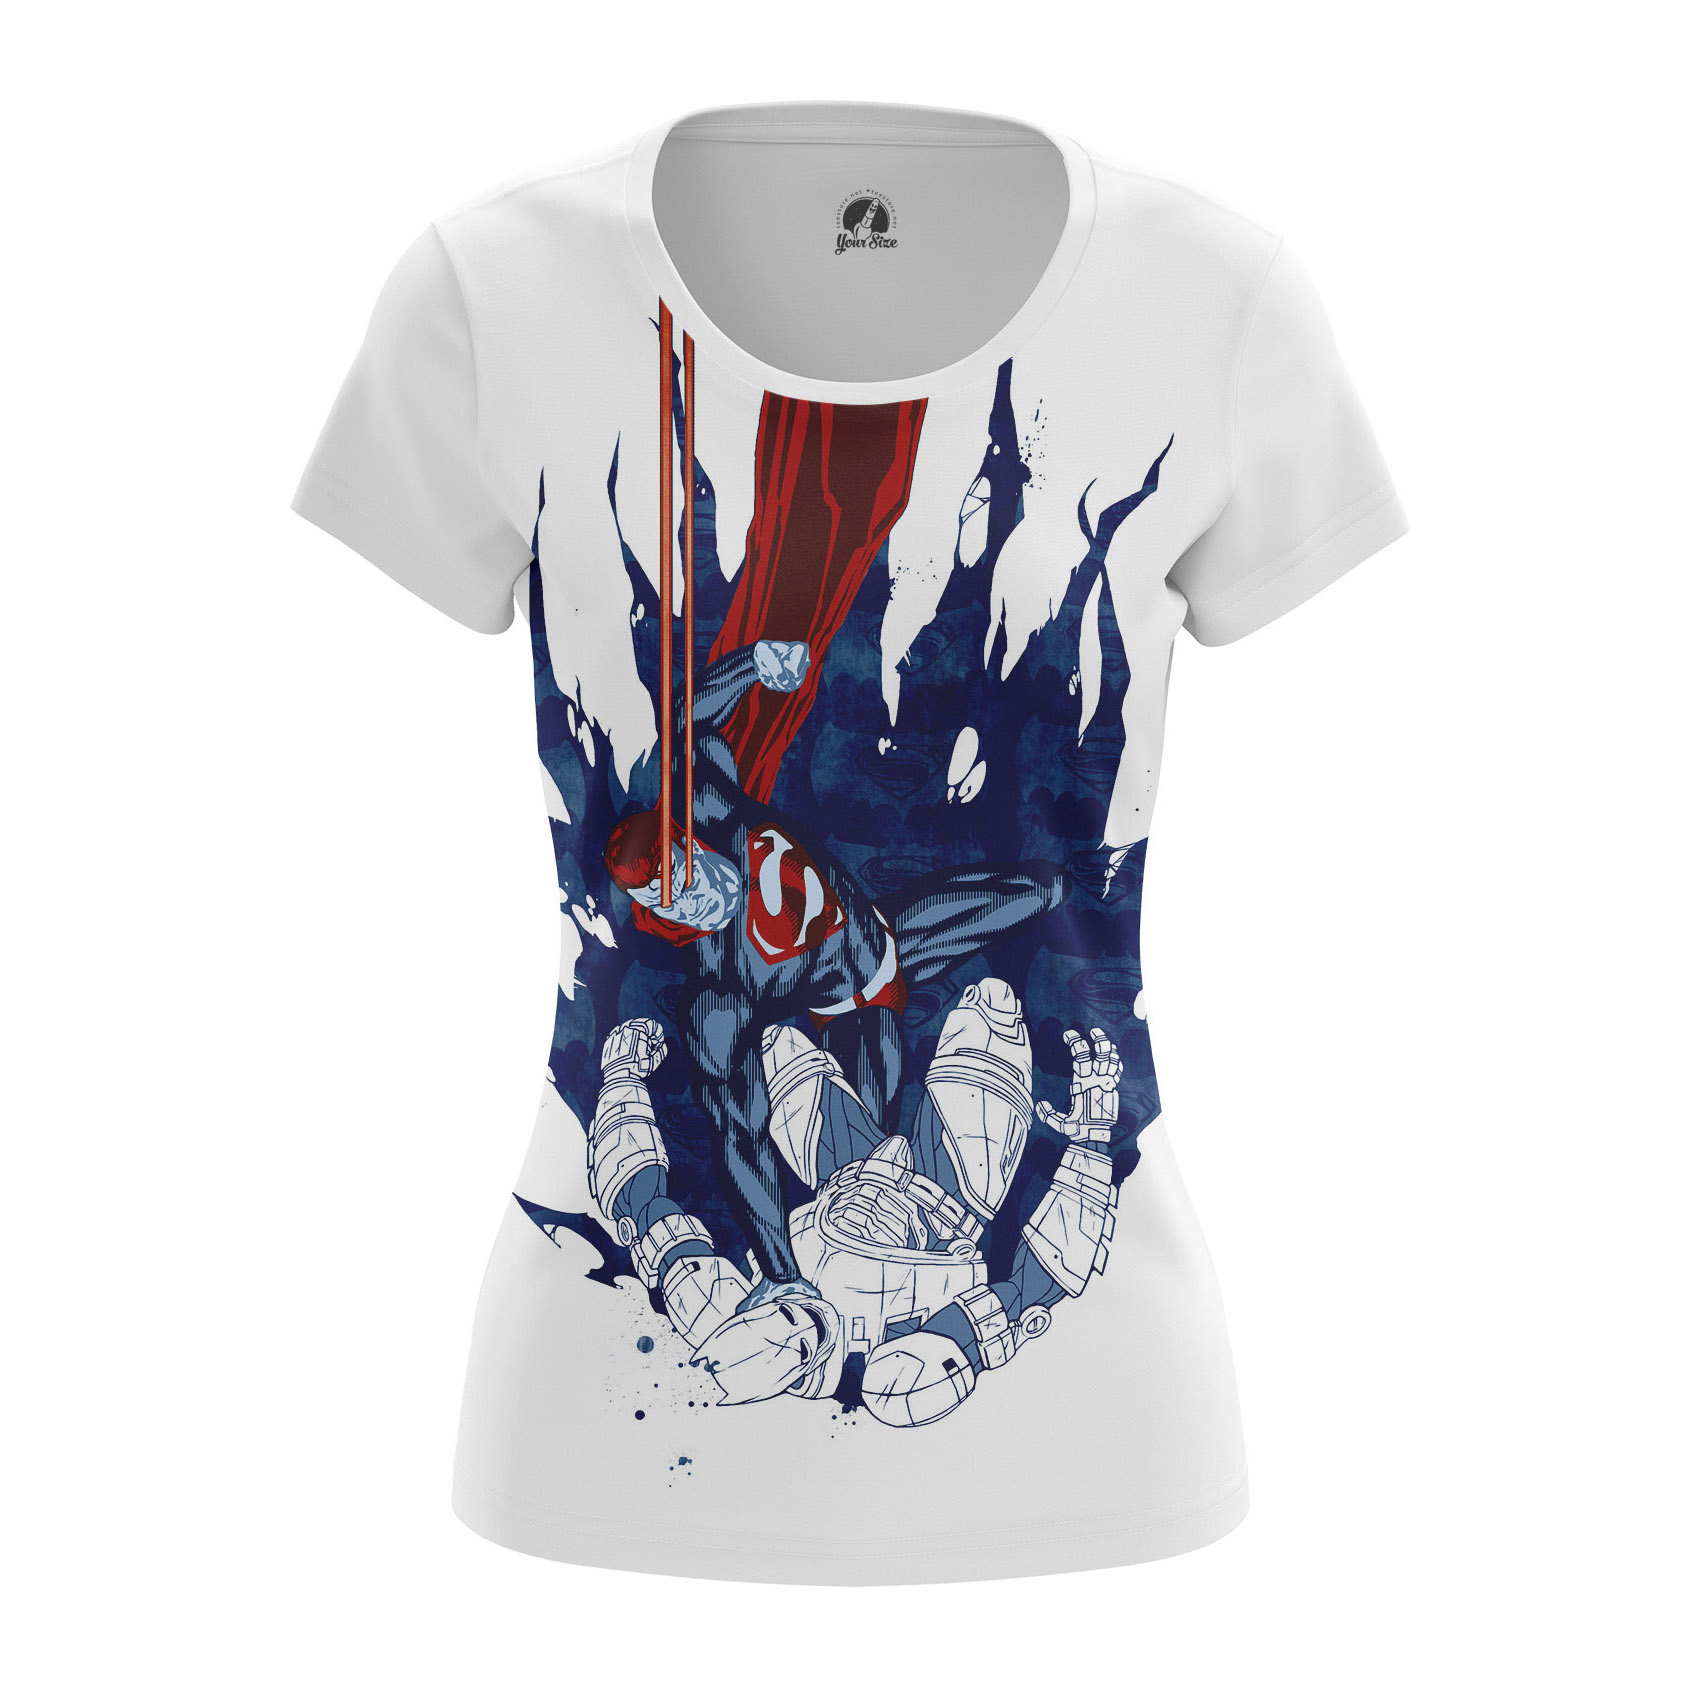 Merchandise - Women'S T-Shirt Dawn Of Justice Batman Superman